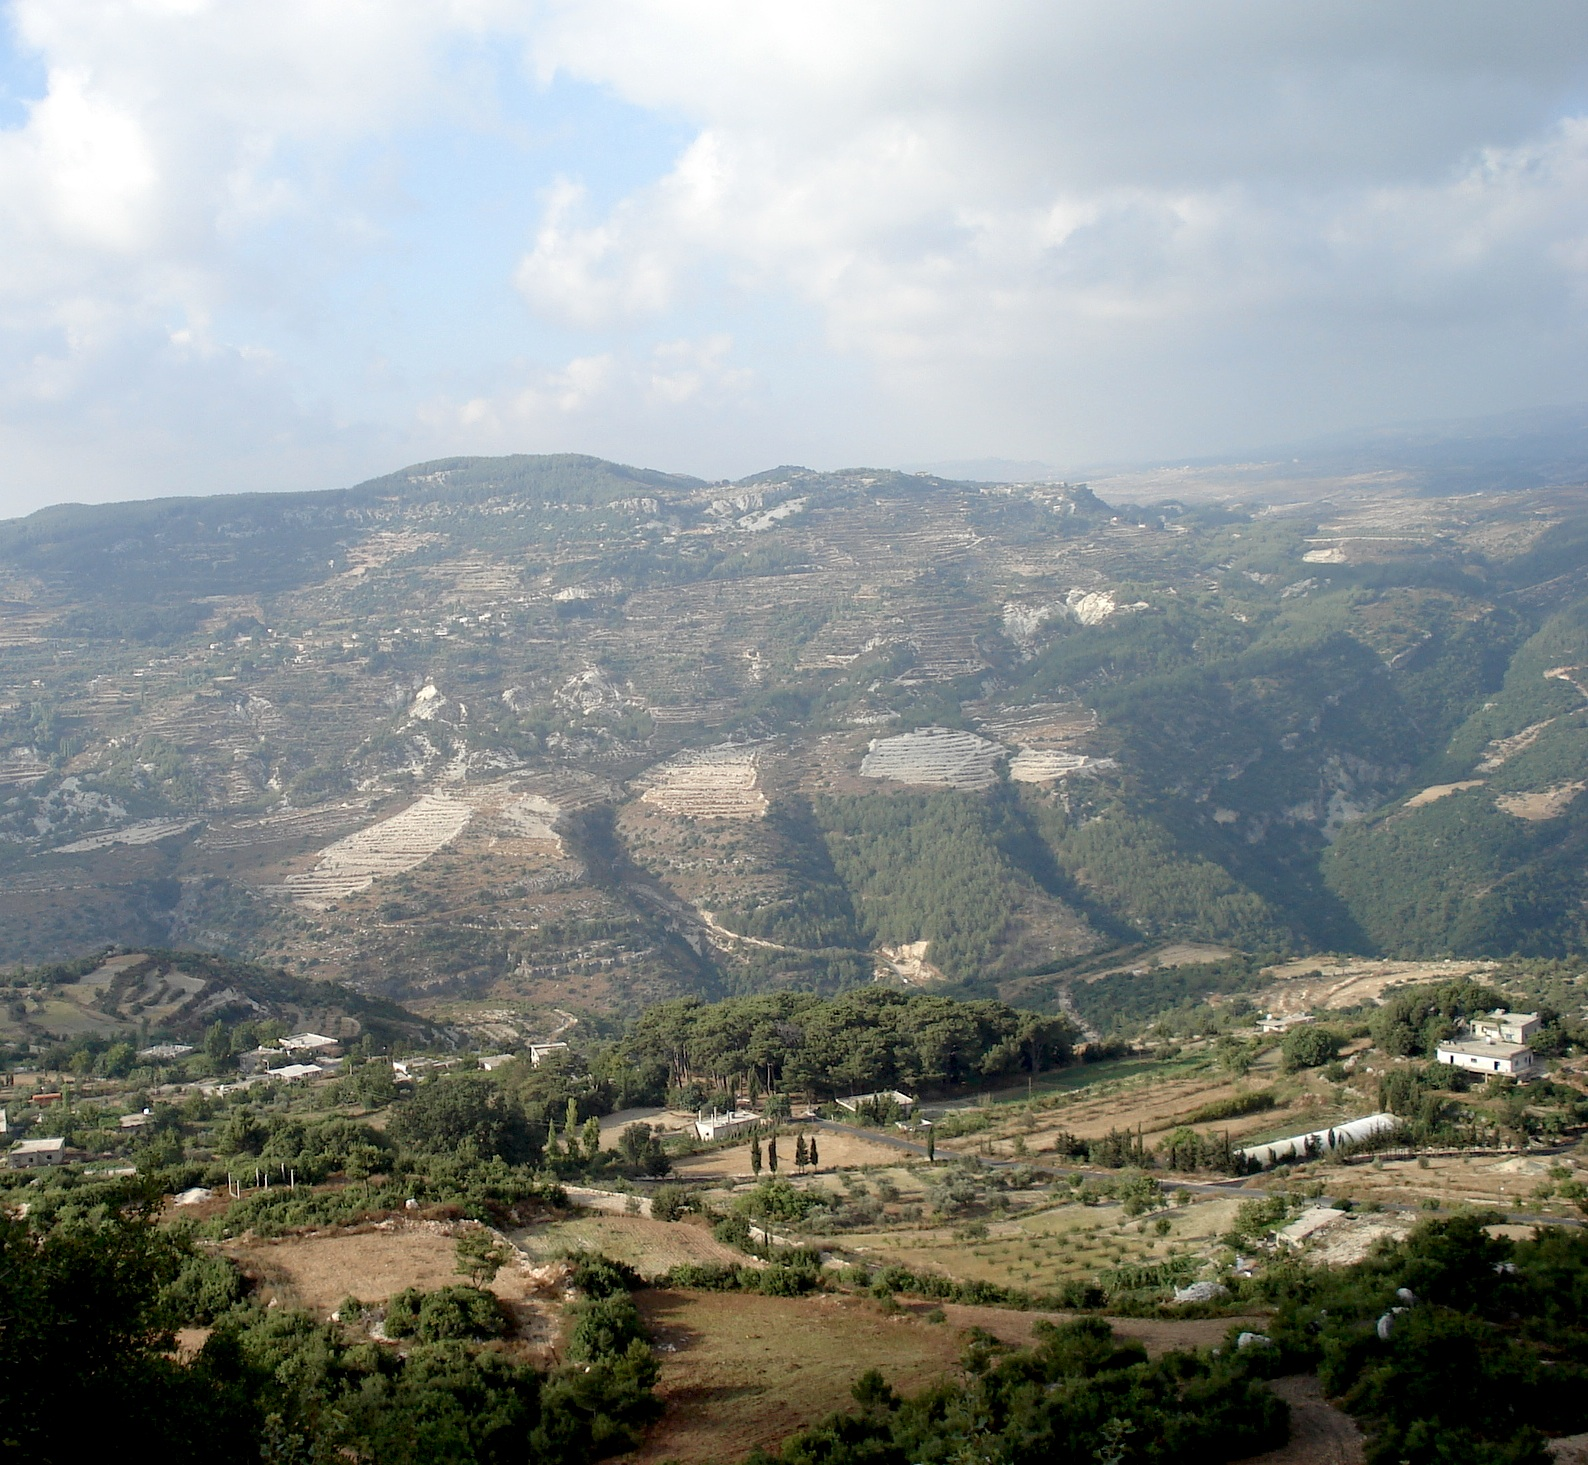 La montagne alaouite vue de la citadelle Qalʿat al-Mahāliba (Balātunus). Photo B. Paoli